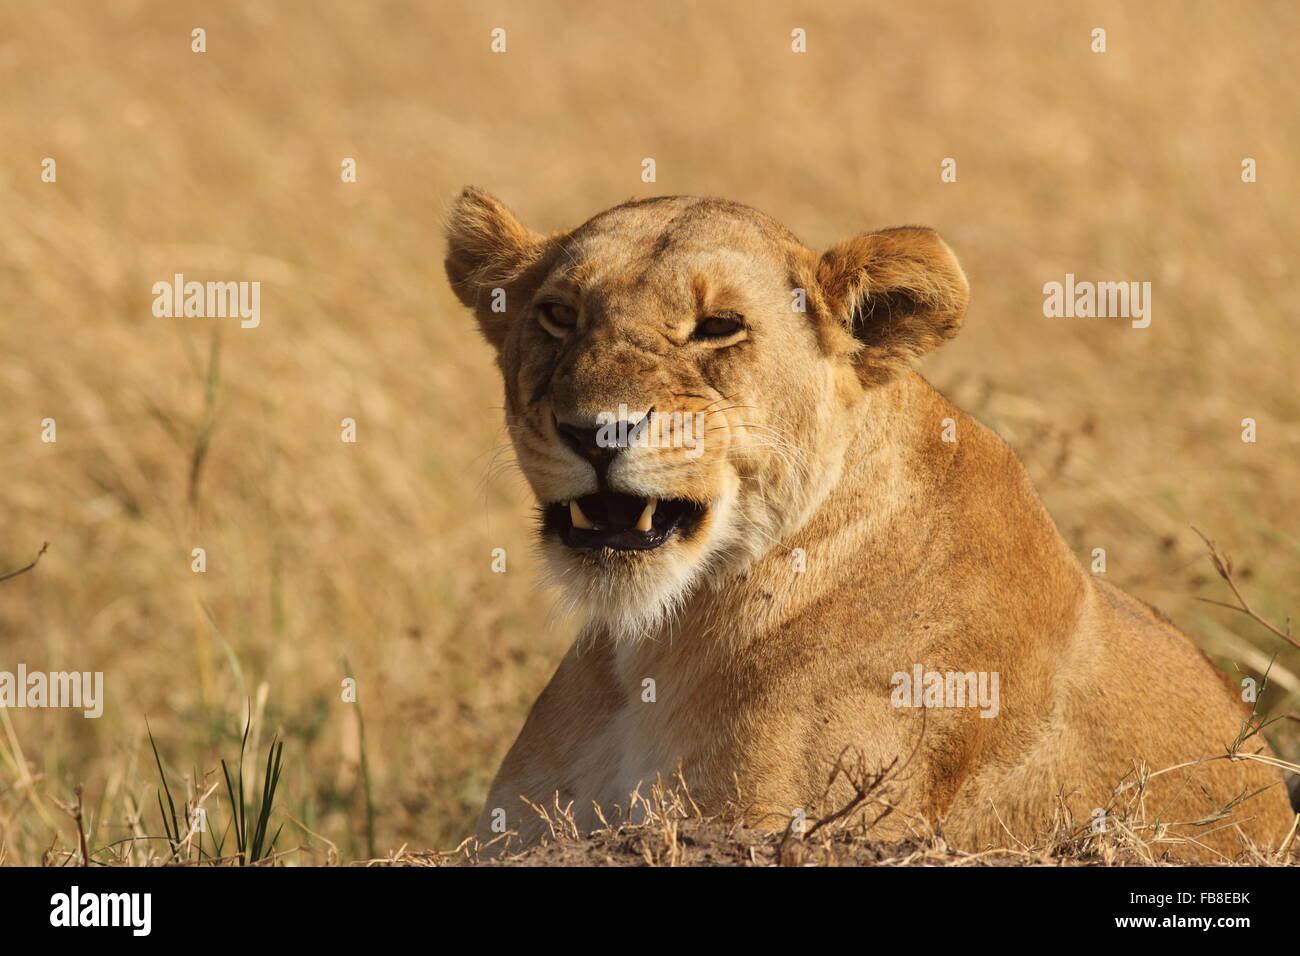 Lion grimacing - Stock Image